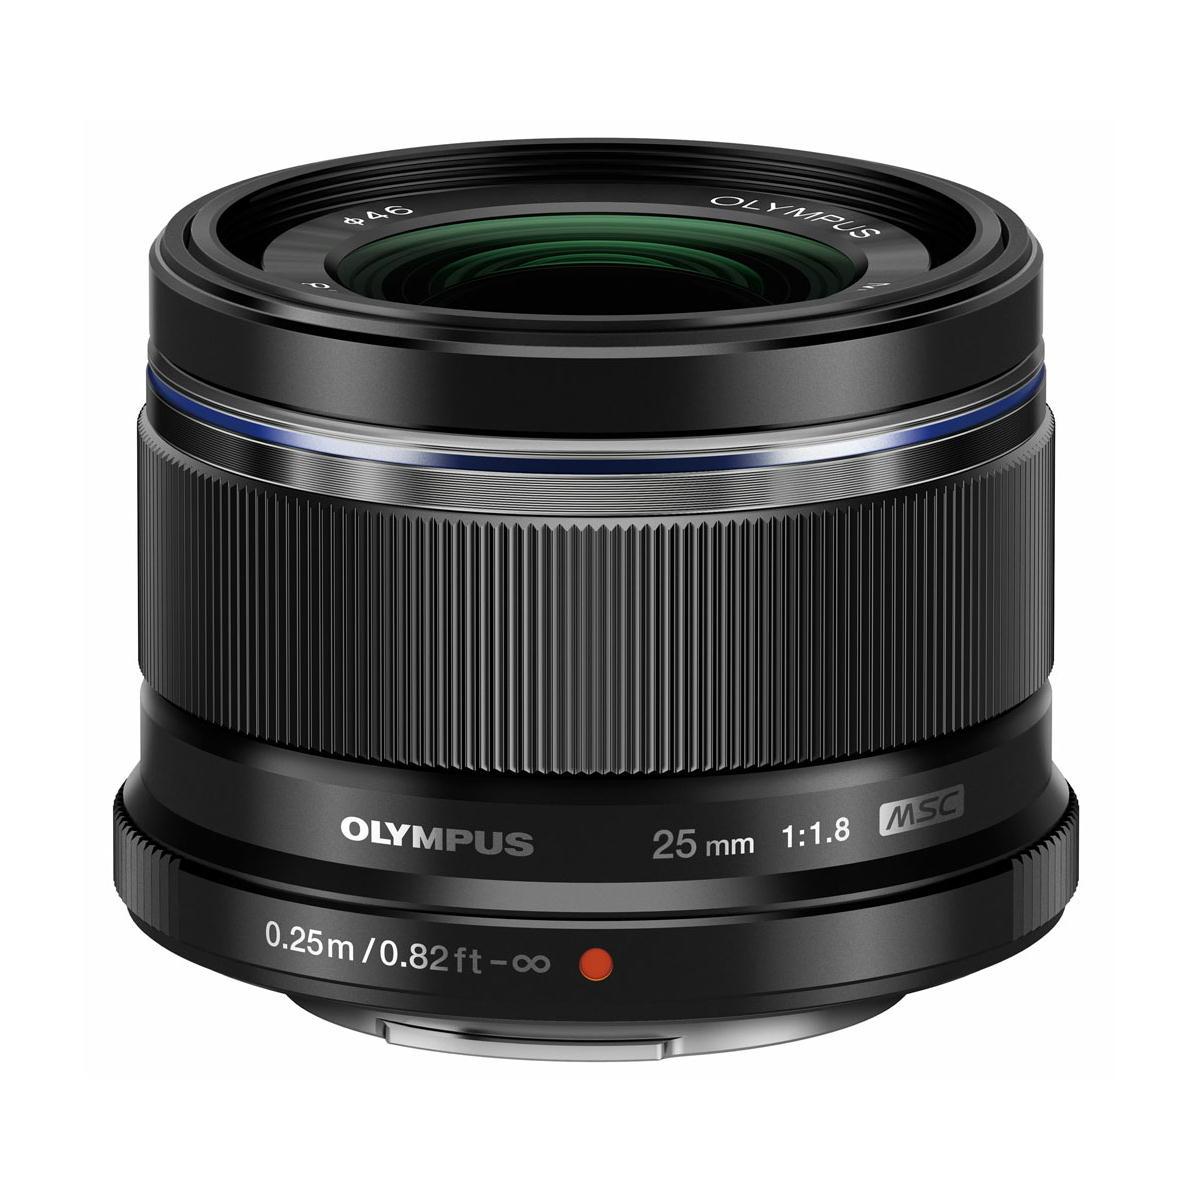 M.ZUIKO DIGITAL 25mm F1.8 | OLYMPUS 高画質標準レンズ